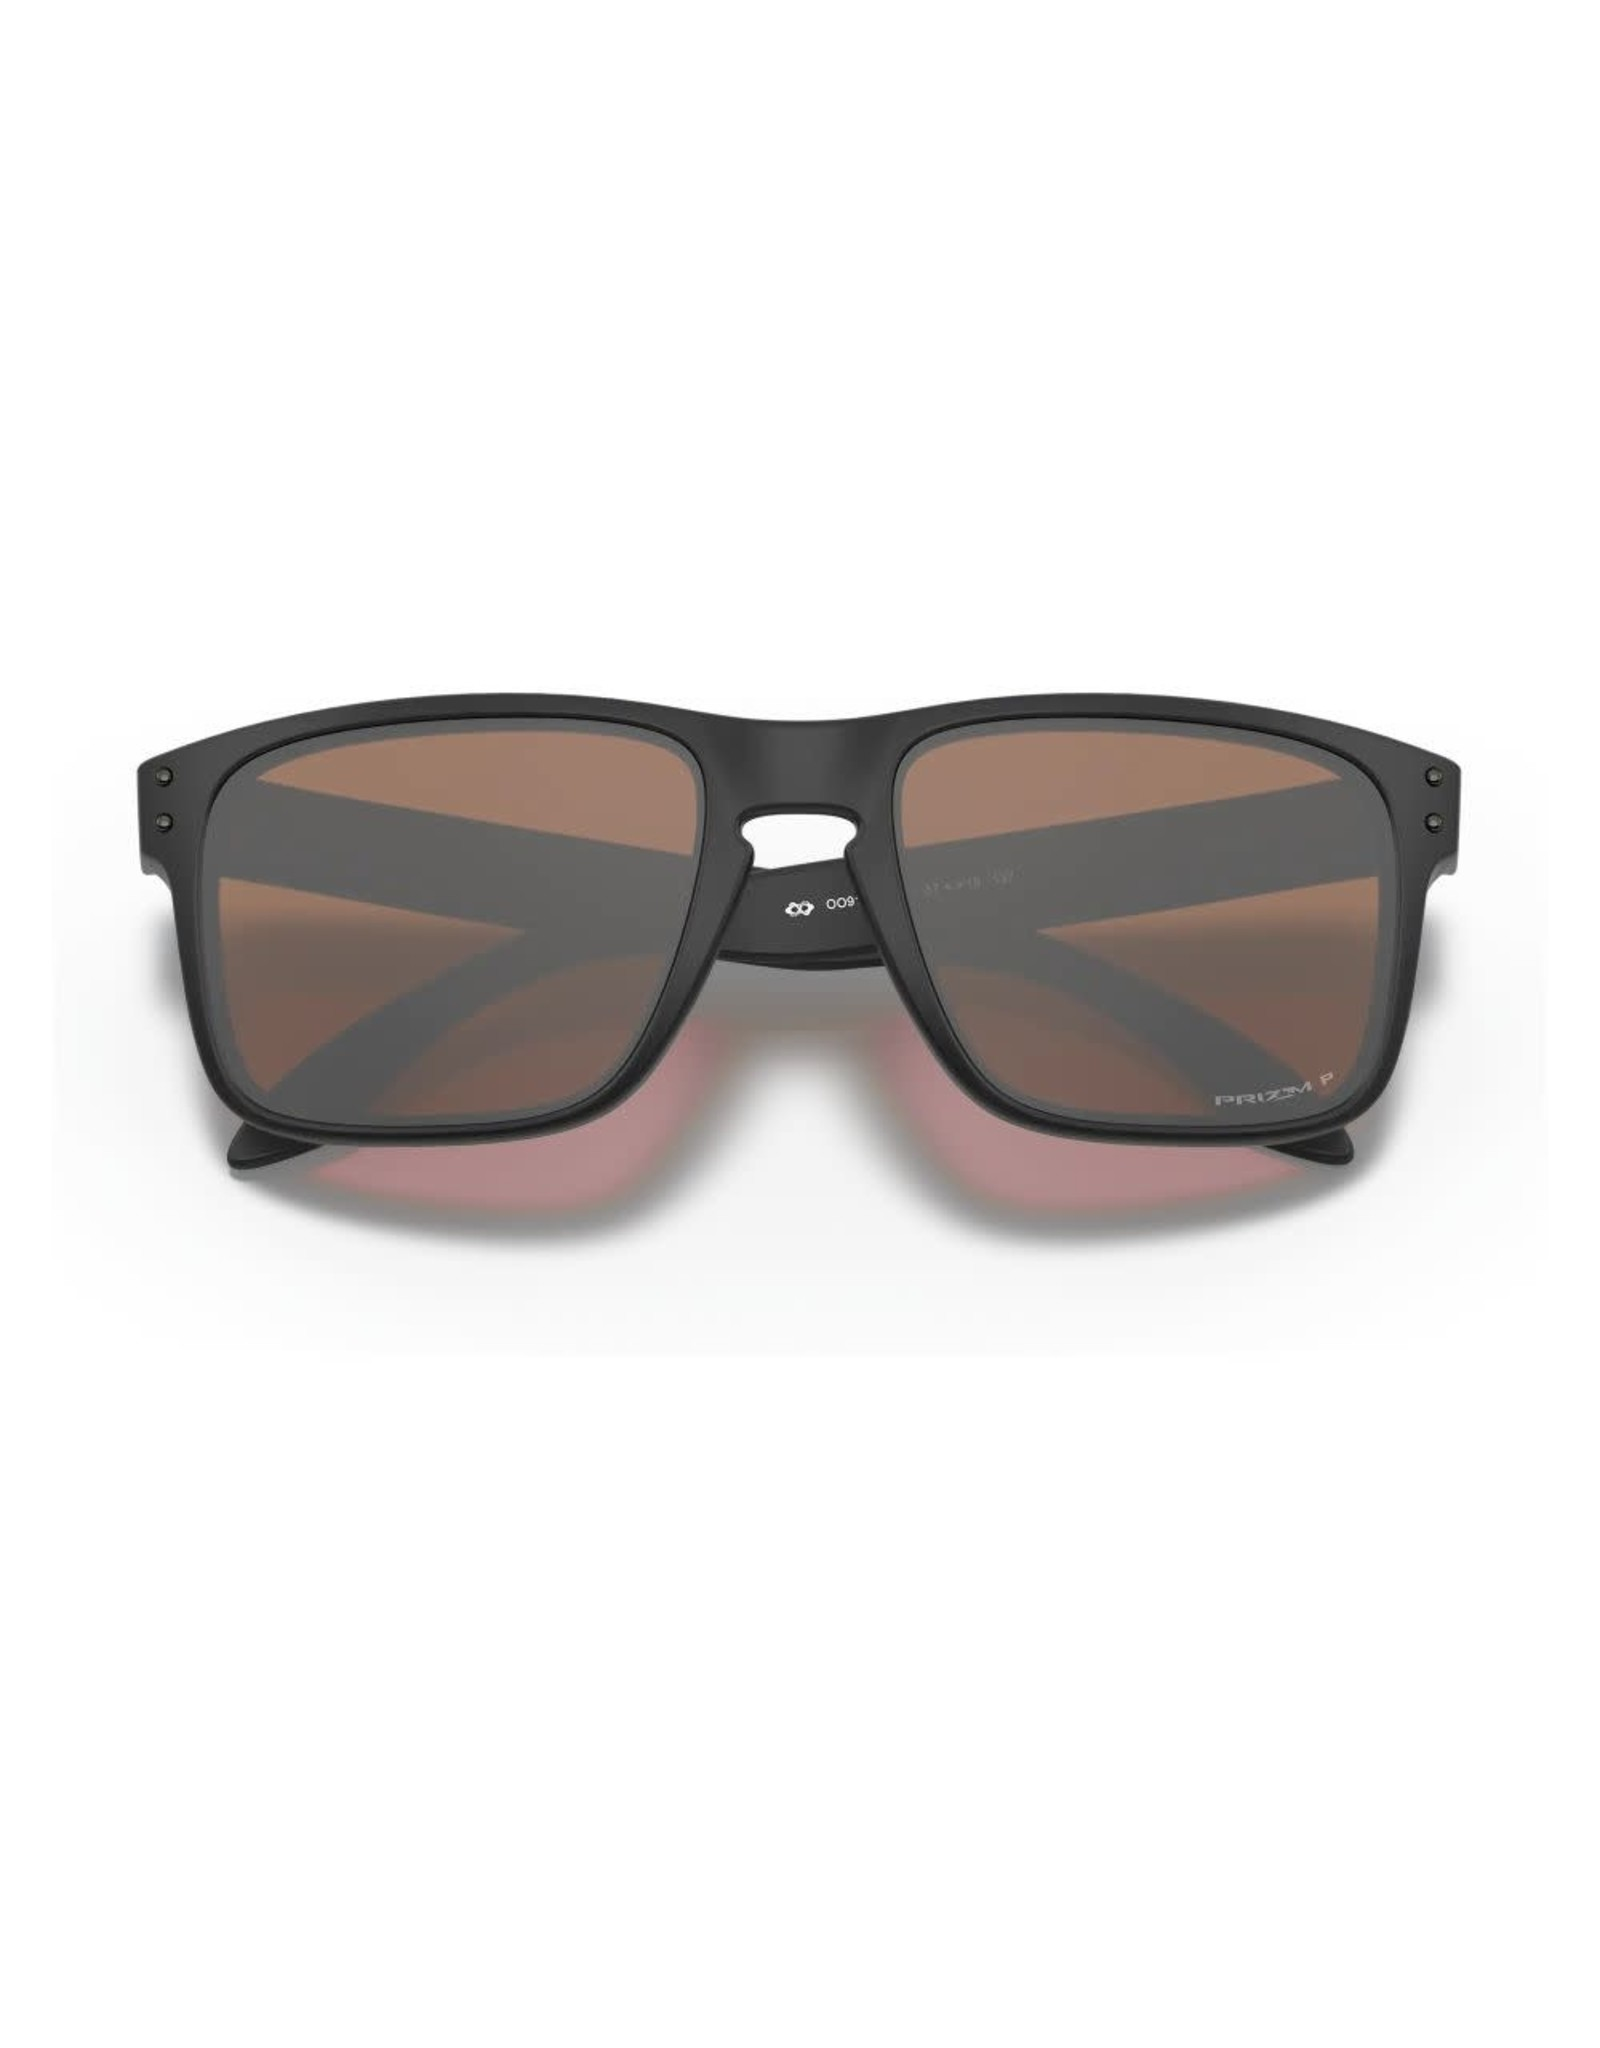 OAKLEY Oakley Holbrook matte black prizm tungsten iridium polarized sunglasses